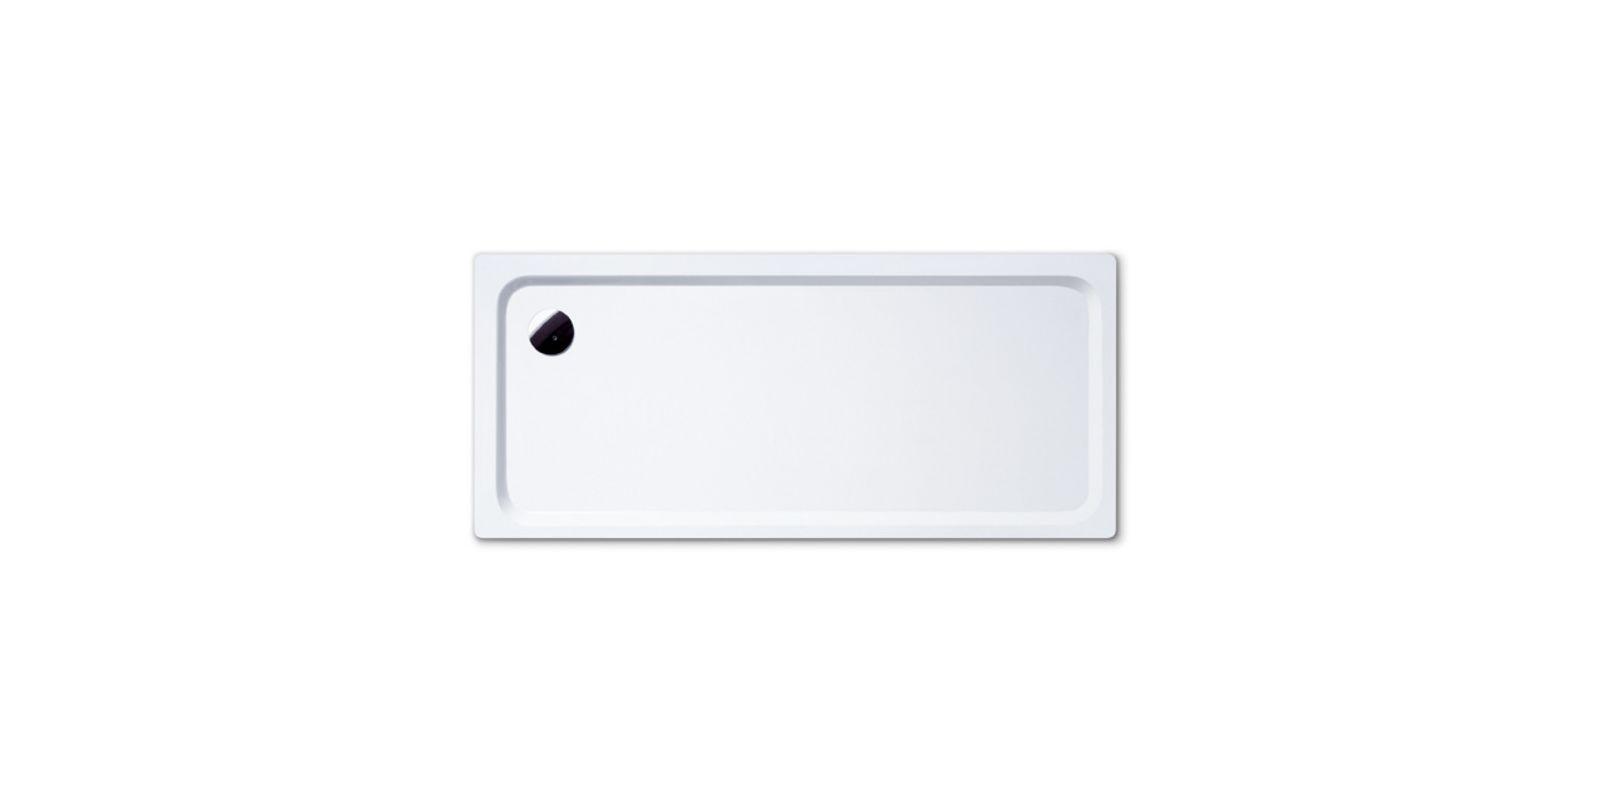 kaldewei 435 1 white superplan xxl shower pan. Black Bedroom Furniture Sets. Home Design Ideas